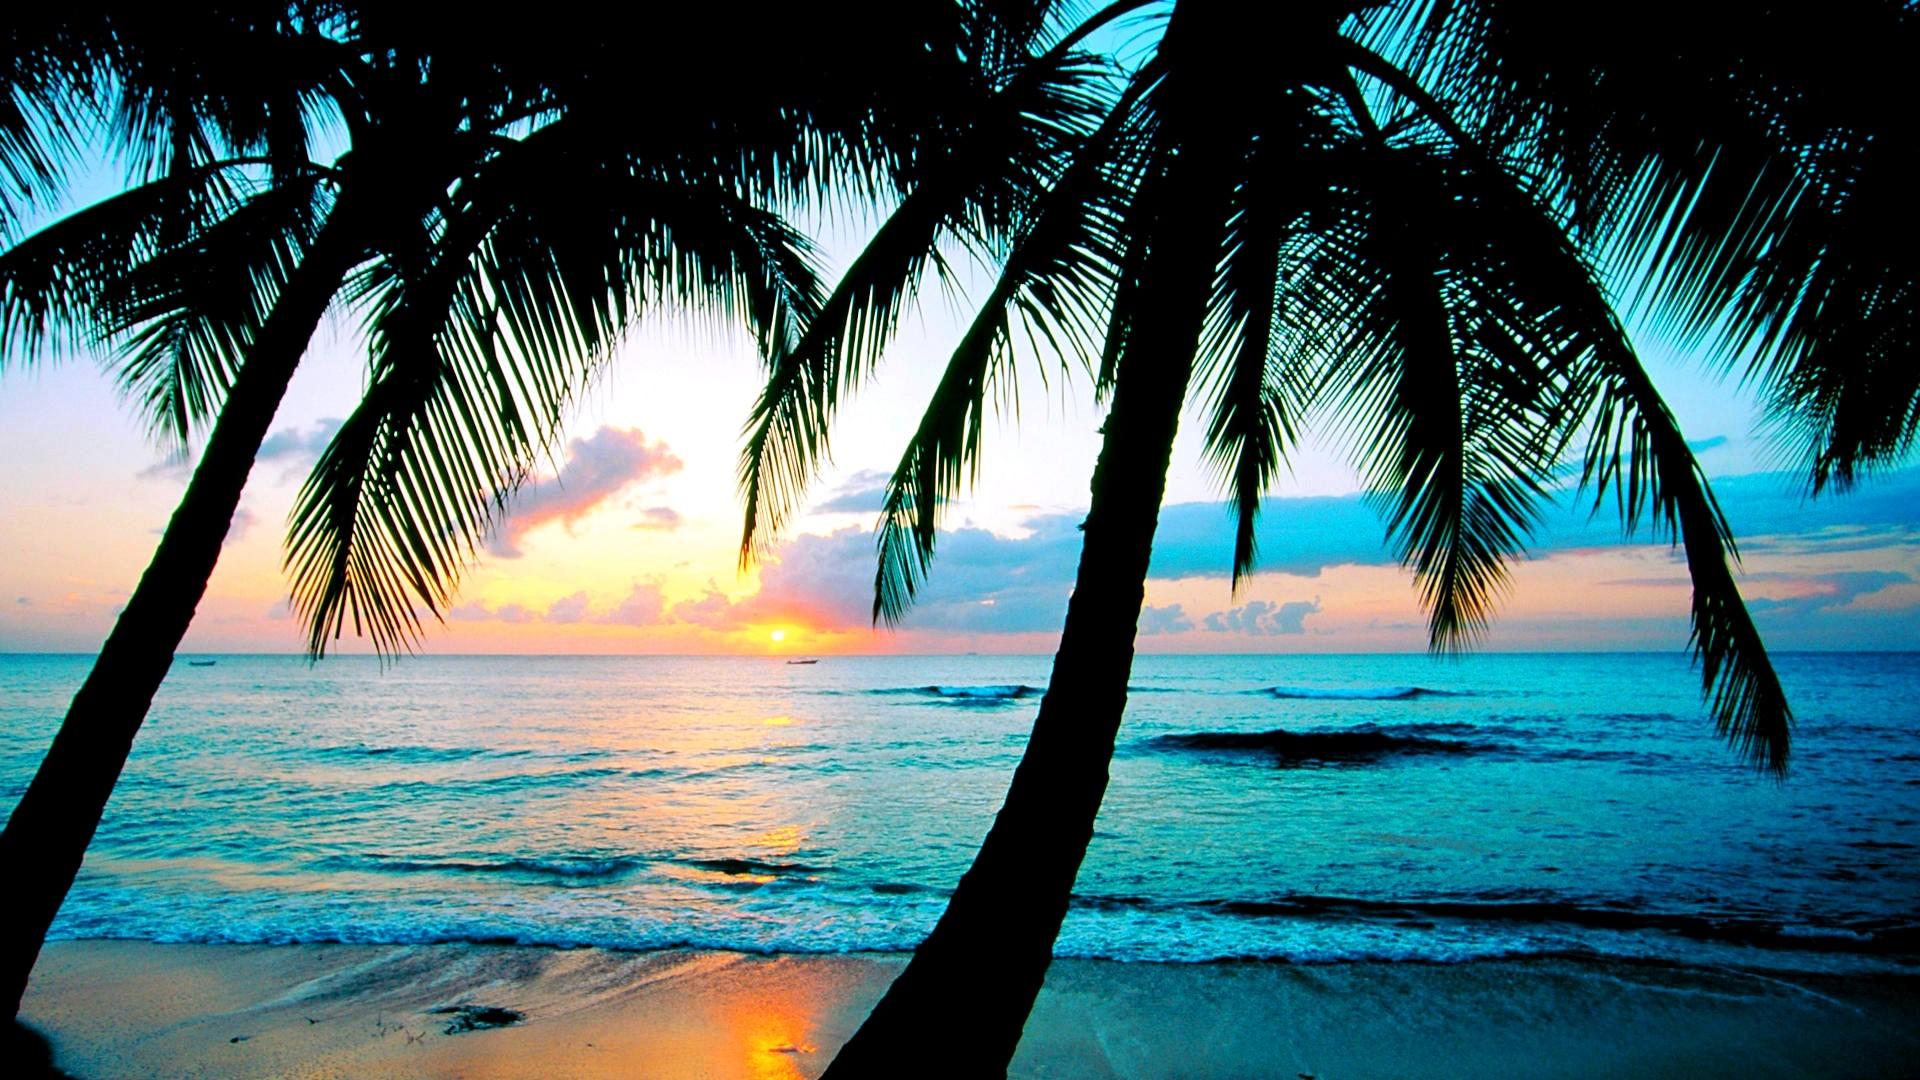 35 Desktop Backgrounds Beach 1 Download Free Beautiful Full HD